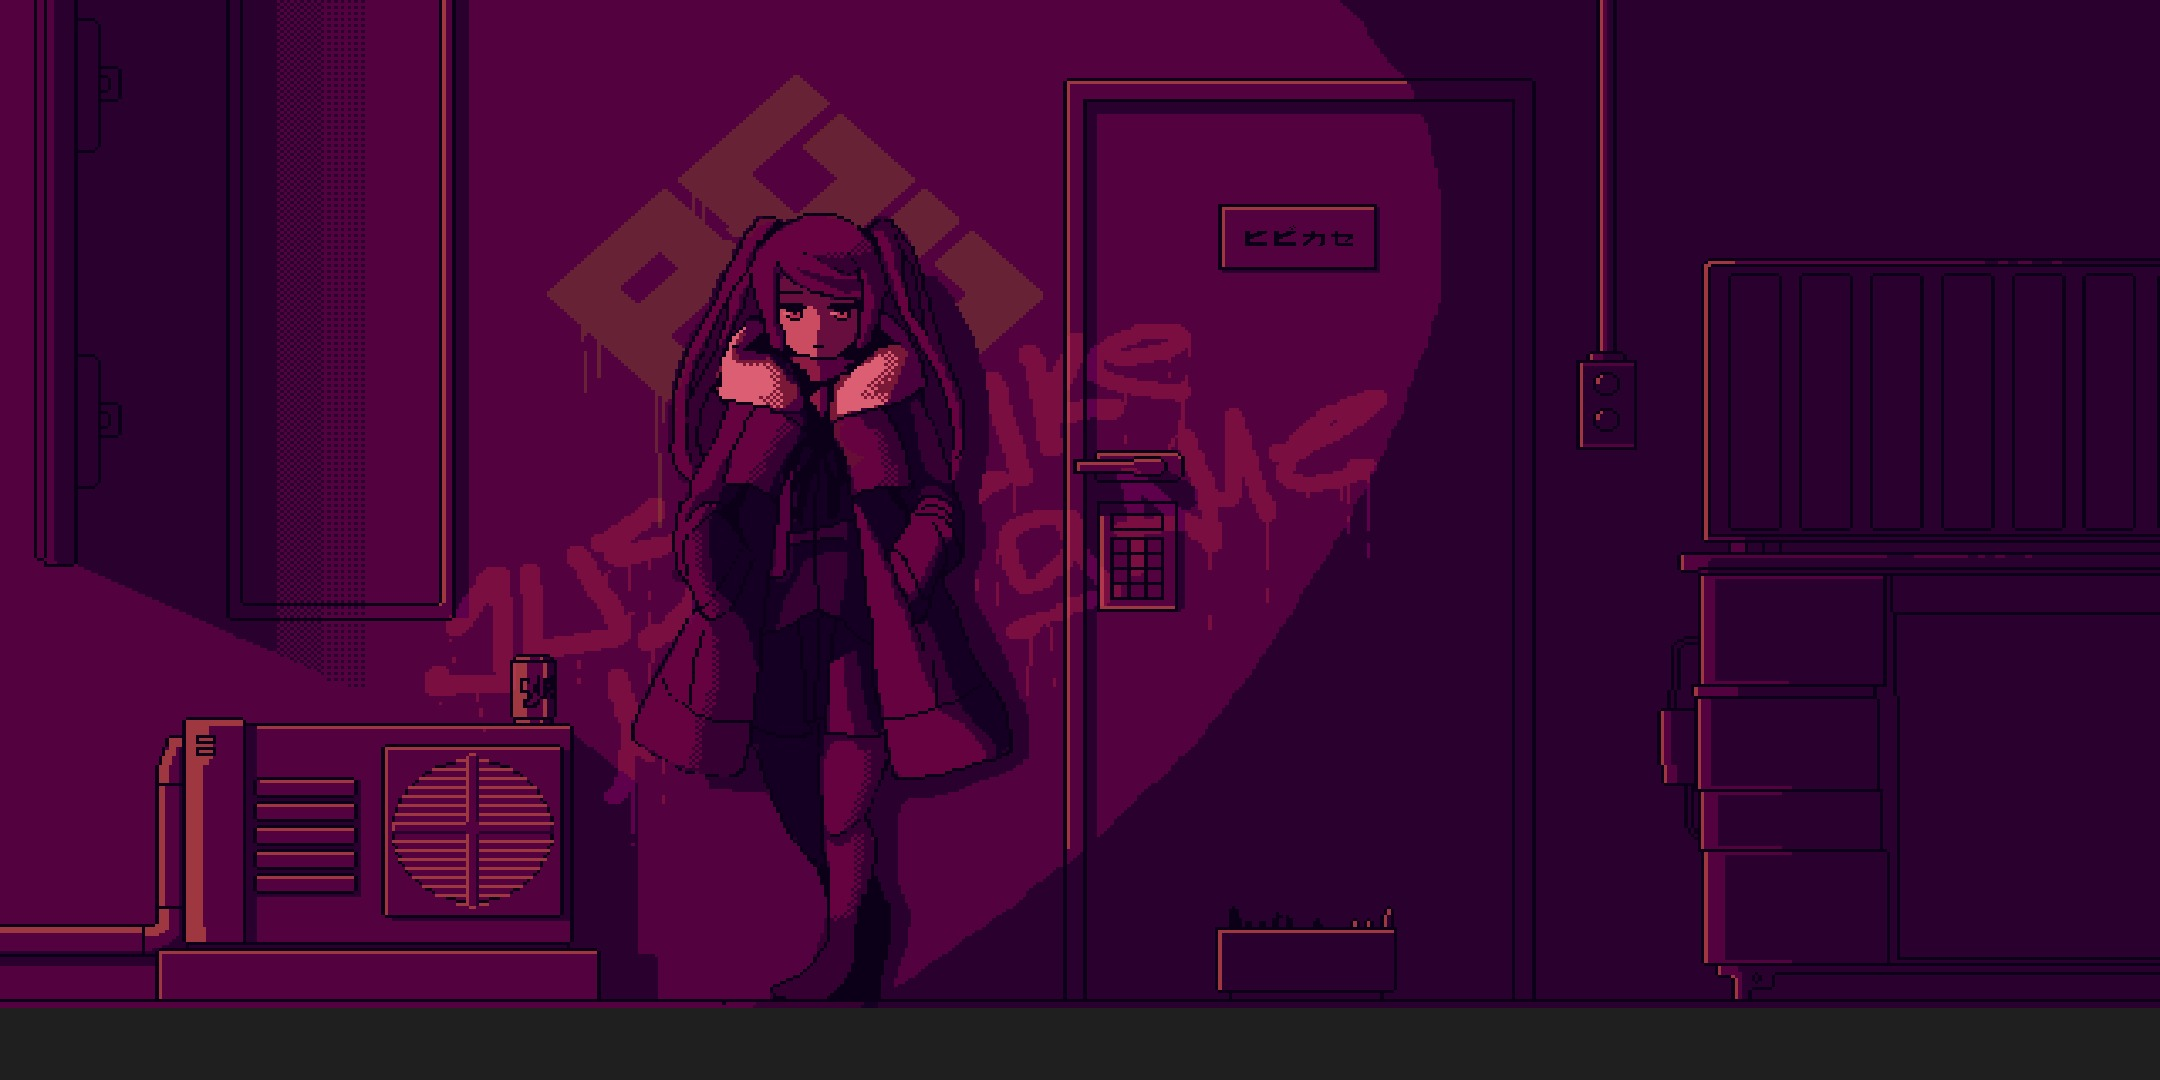 Jill VA-11 Hall-A Wallpaper, HD Anime 4K Wallpapers ...